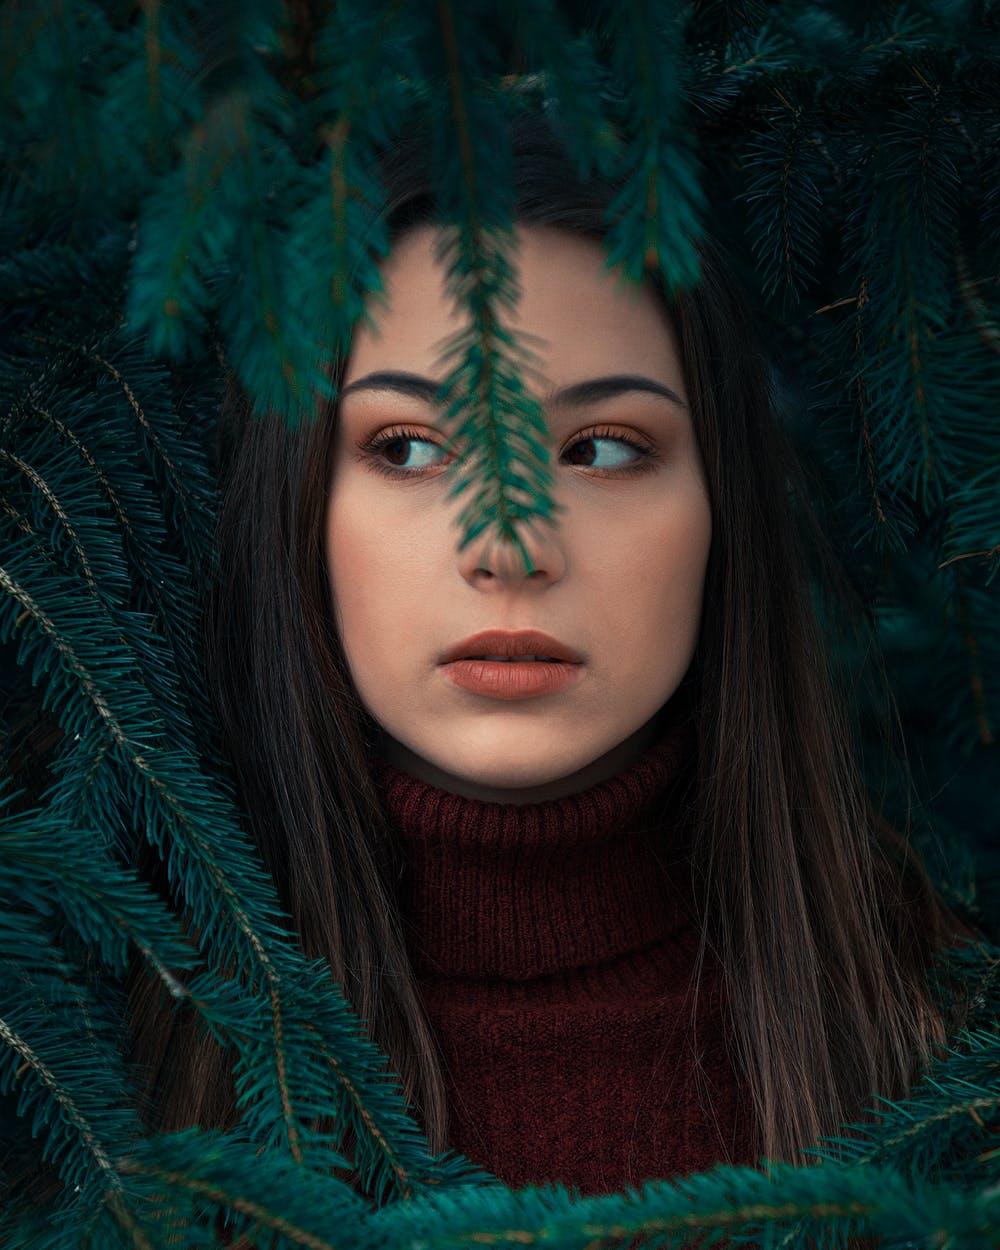 Girl behind branch